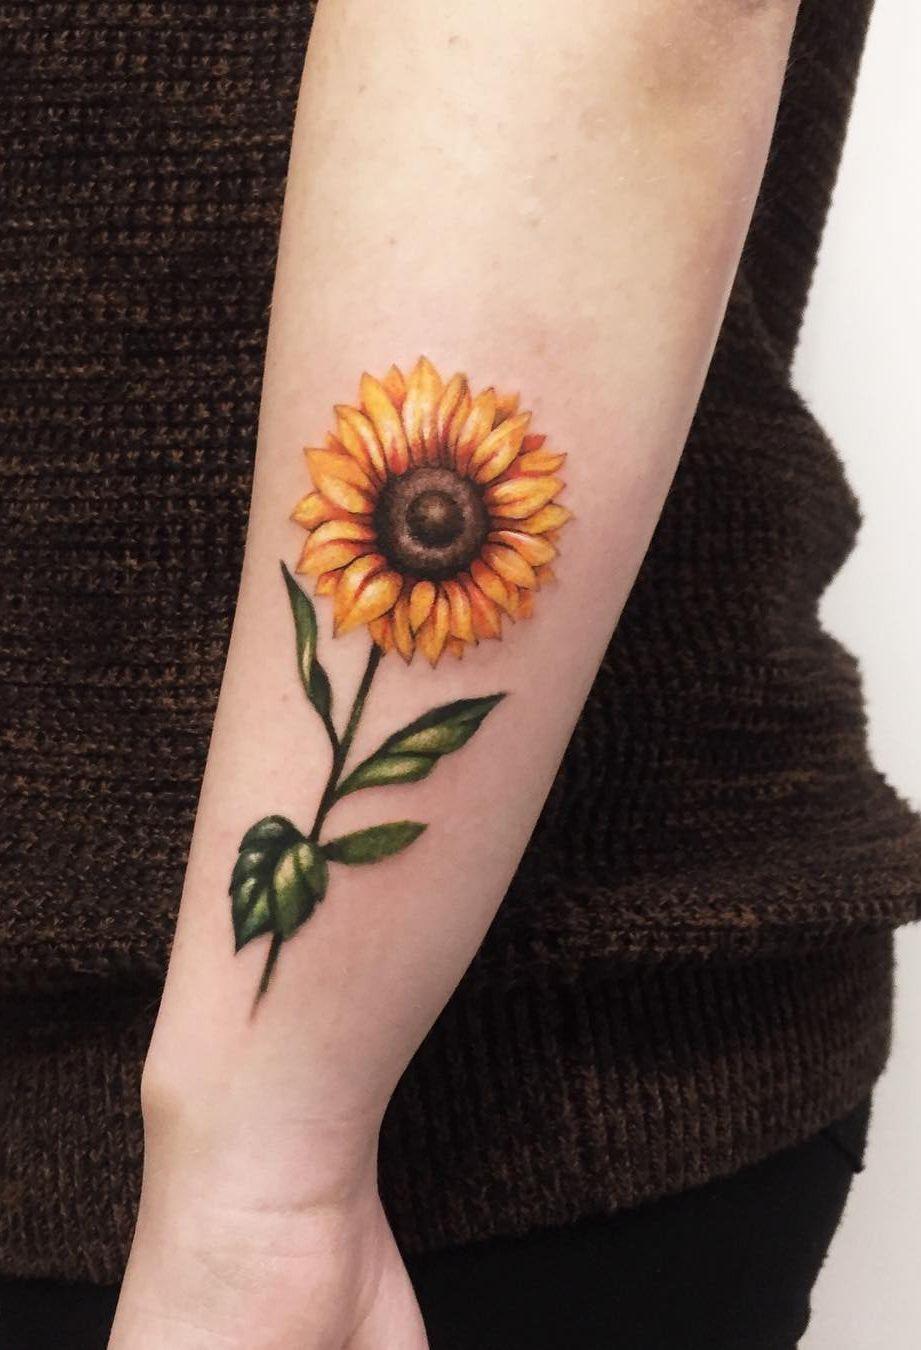 Pin by Tiahna Austin on Tattoos in 2020 Sunflower tattoo